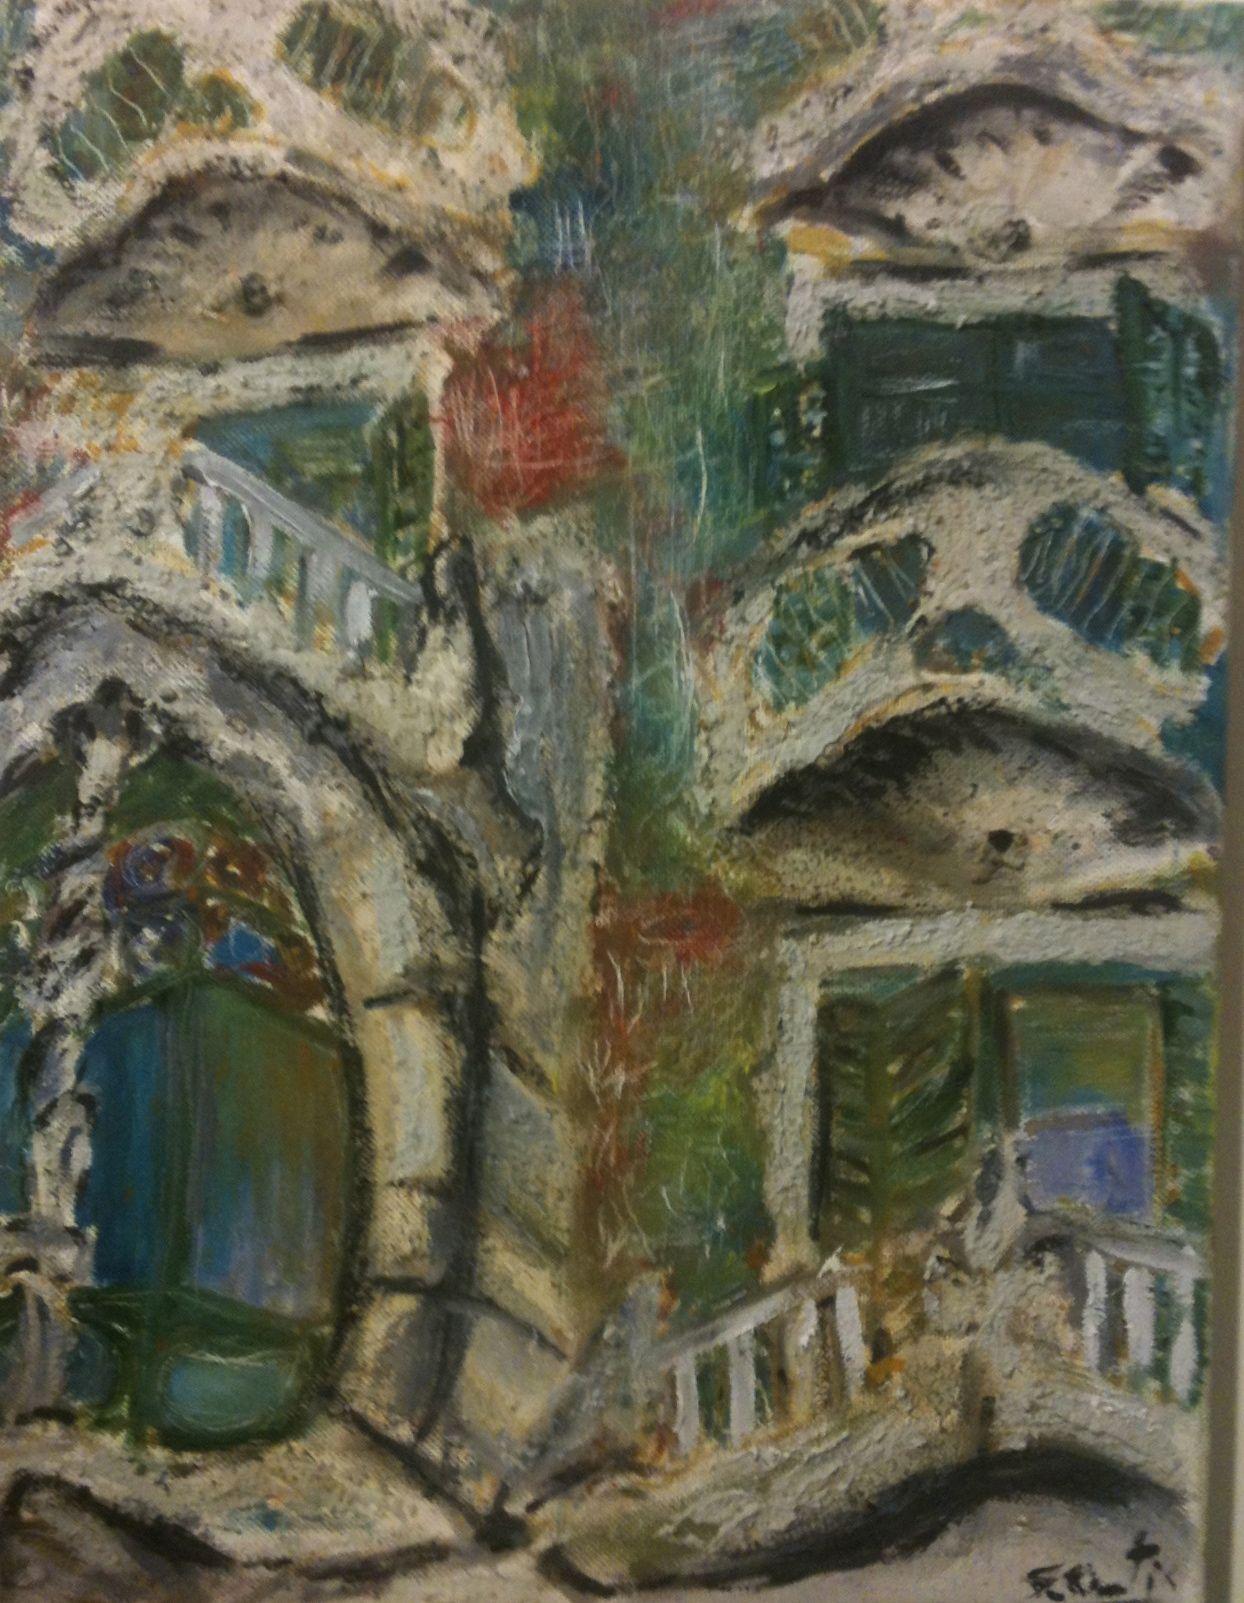 Gaudi Cuadro a Barcelona# Casa Batlló Barcelona Gaudi pintura# Pinturas sobre Barcelona# pinturas murales#